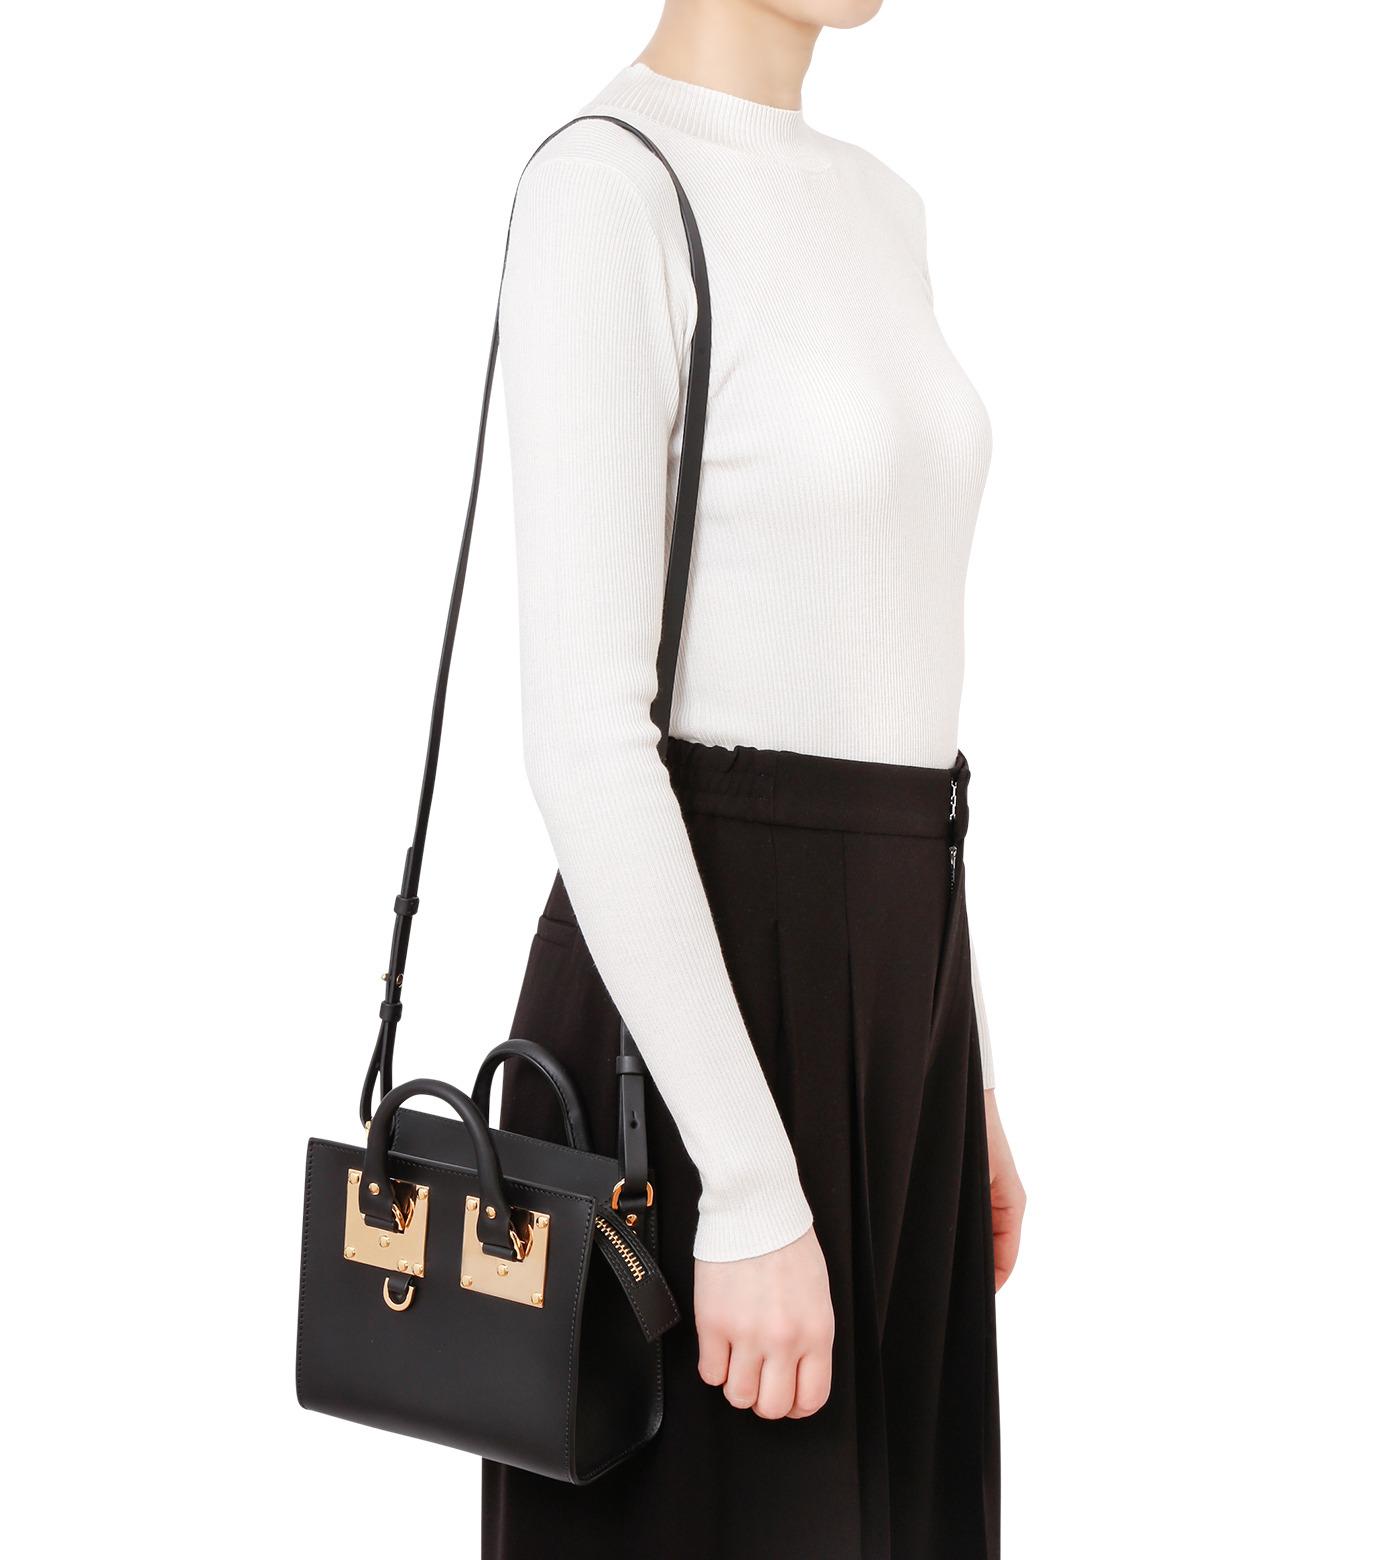 Sophie Hulme(ソフィーヒュルム)のBox Tote Bag-BLACK(ショルダーバッグ/shoulder bag)-BG070LE-13 拡大詳細画像5